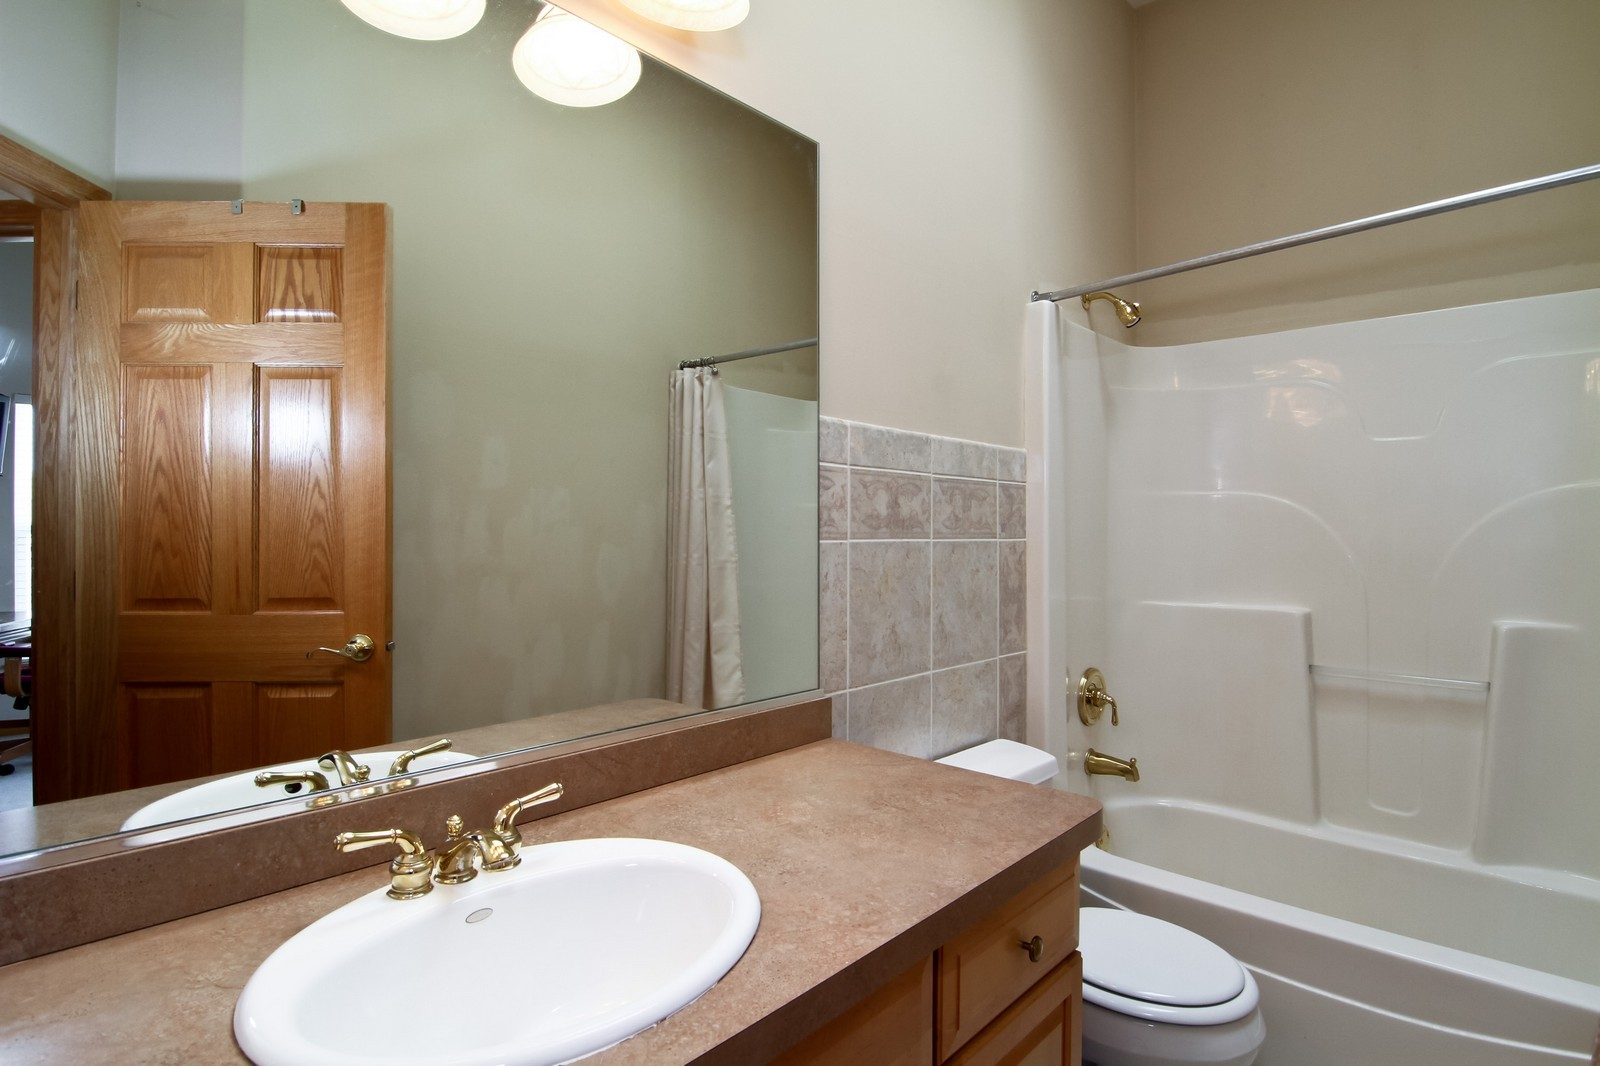 Real Estate Photography - 1135 Ironwood Ln, Lisle, IL, 60532 - Bathroom